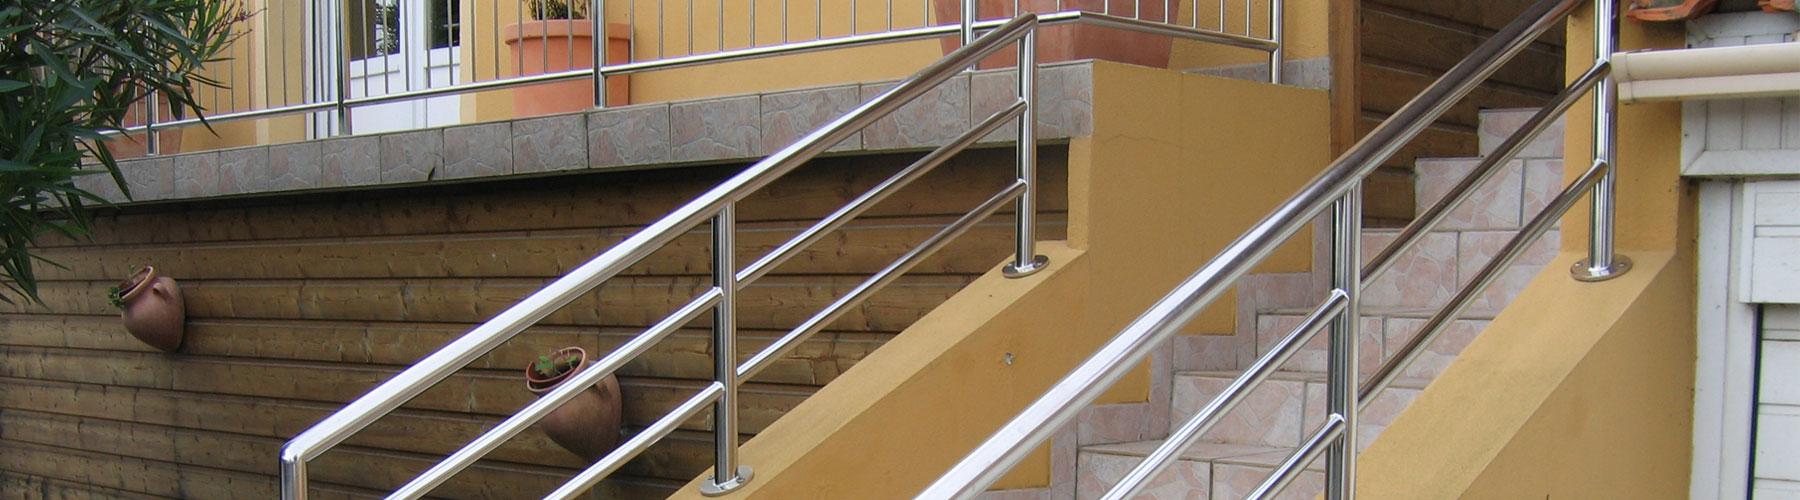 Savoir-faire SVTM Rambarde d'escalier